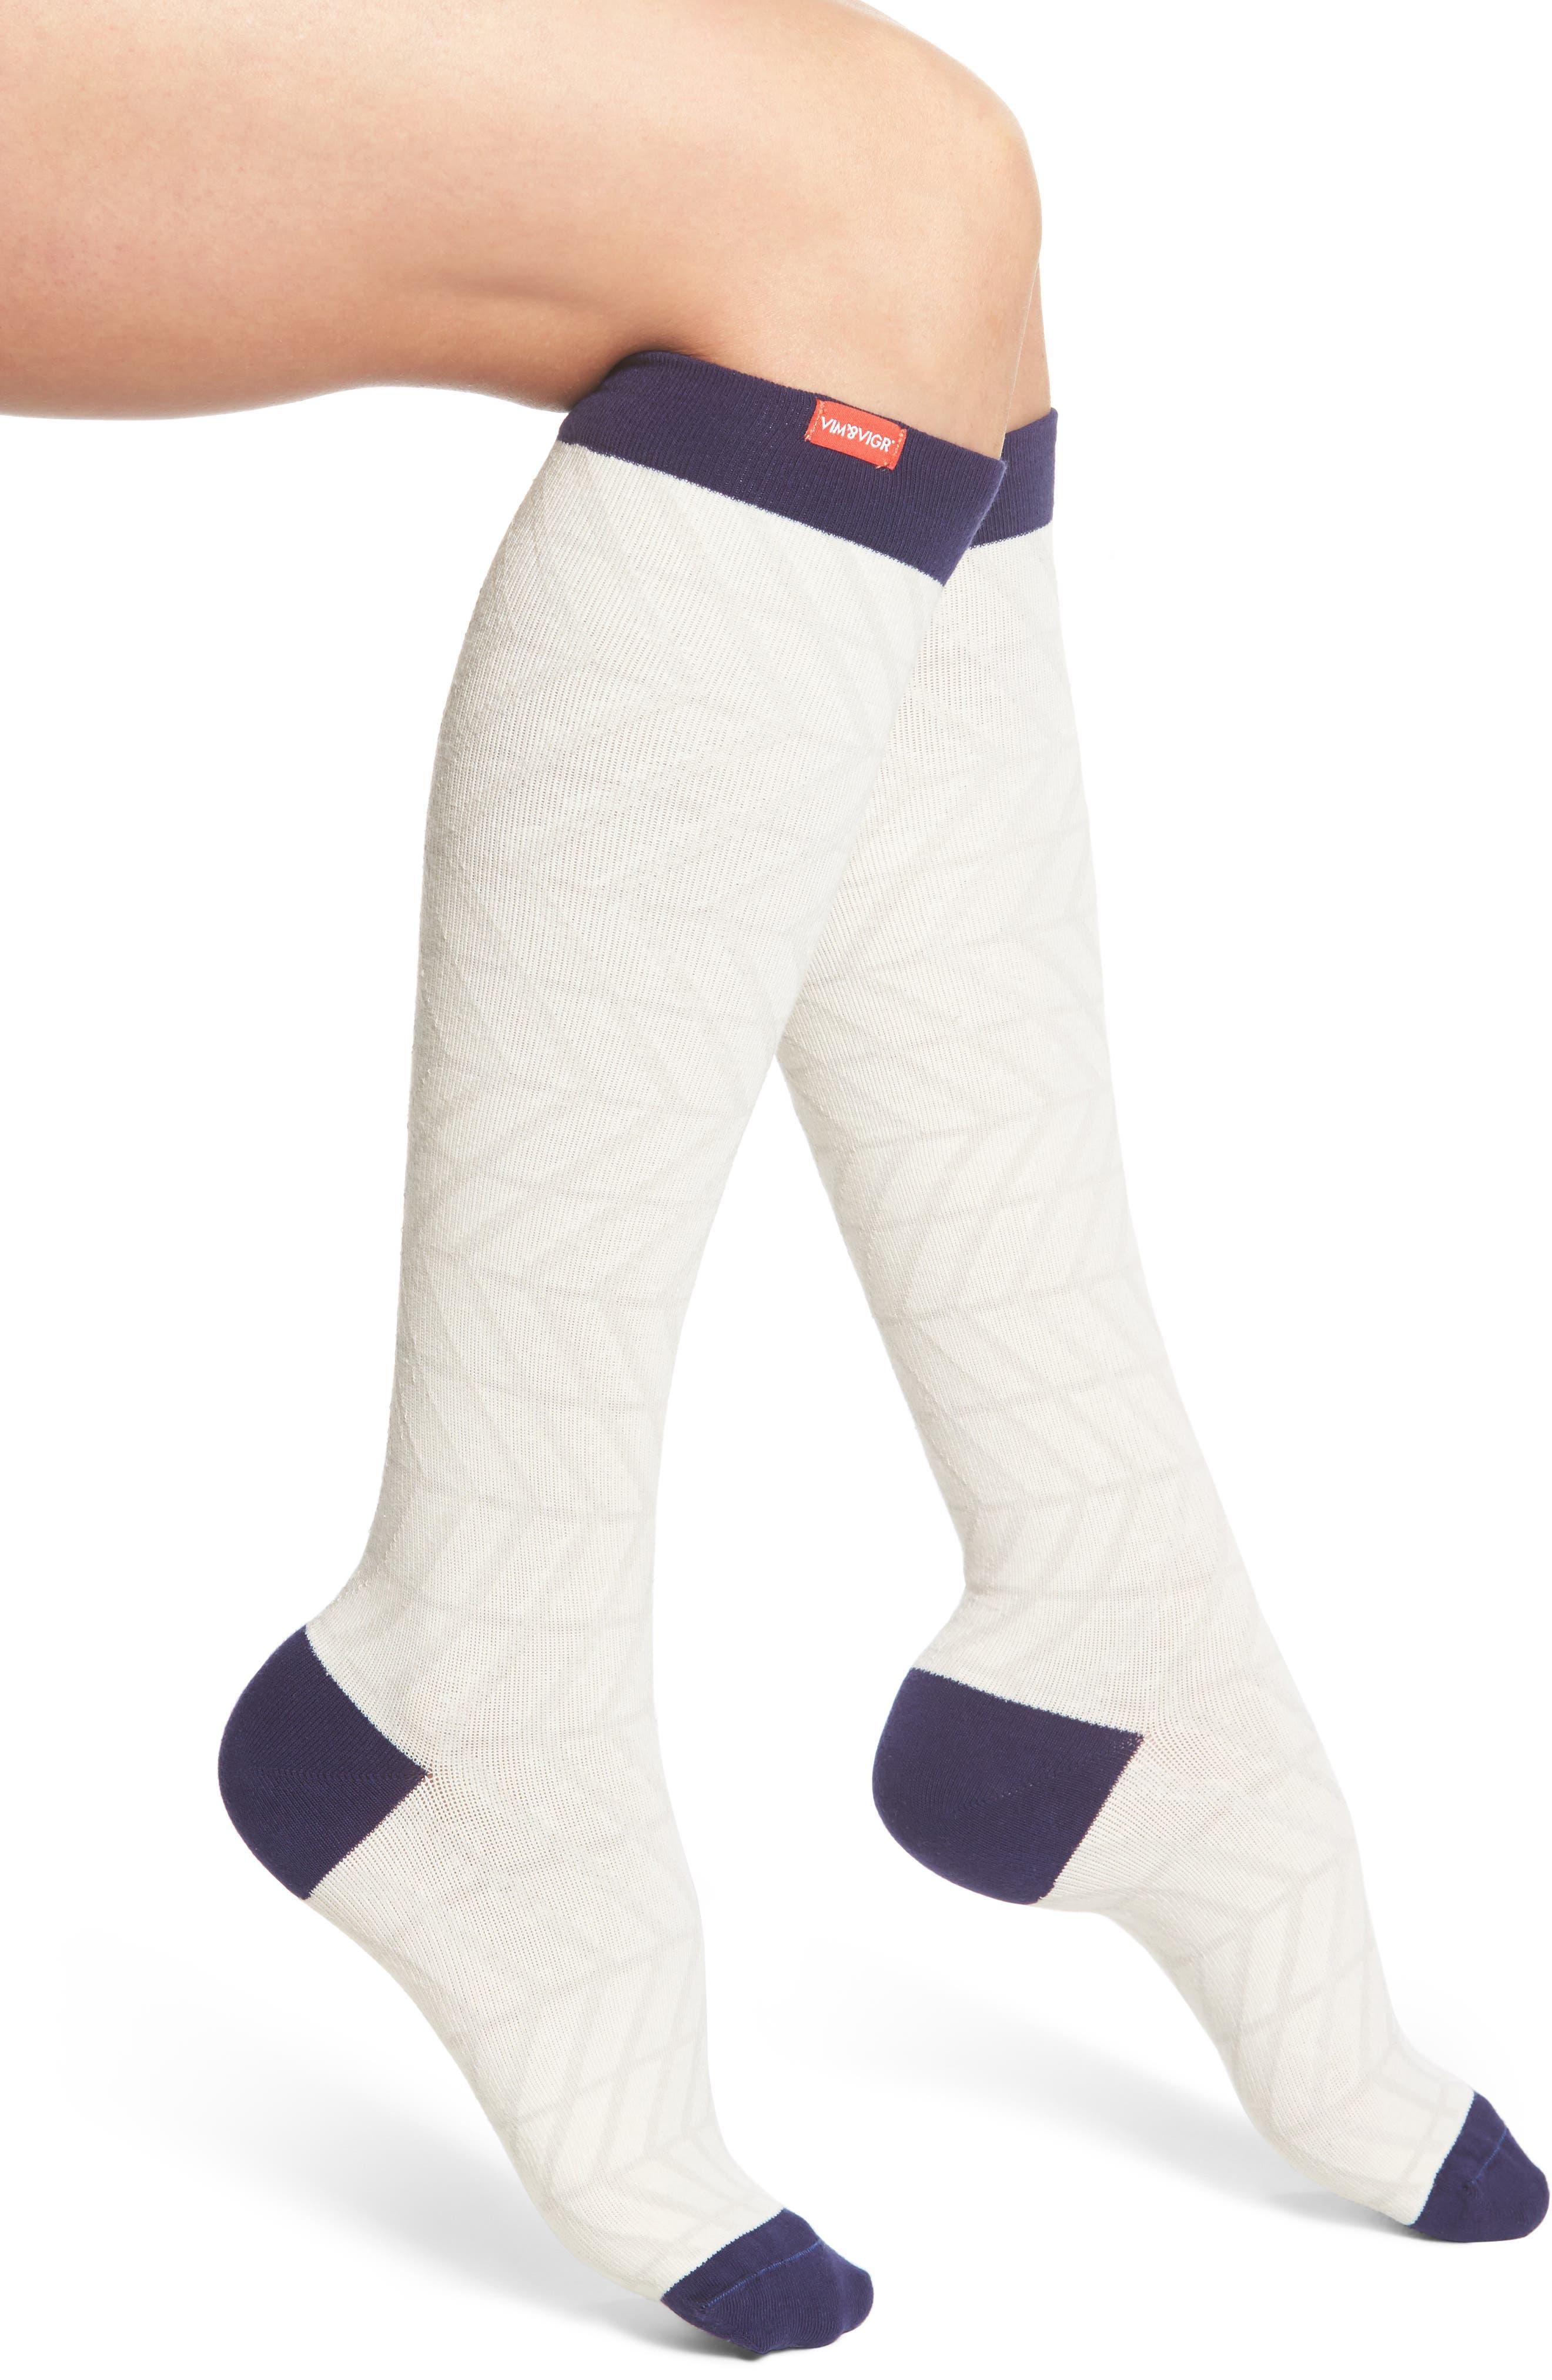 Zigzag Compression Socks,                         Main,                         color, Cream/ Navy